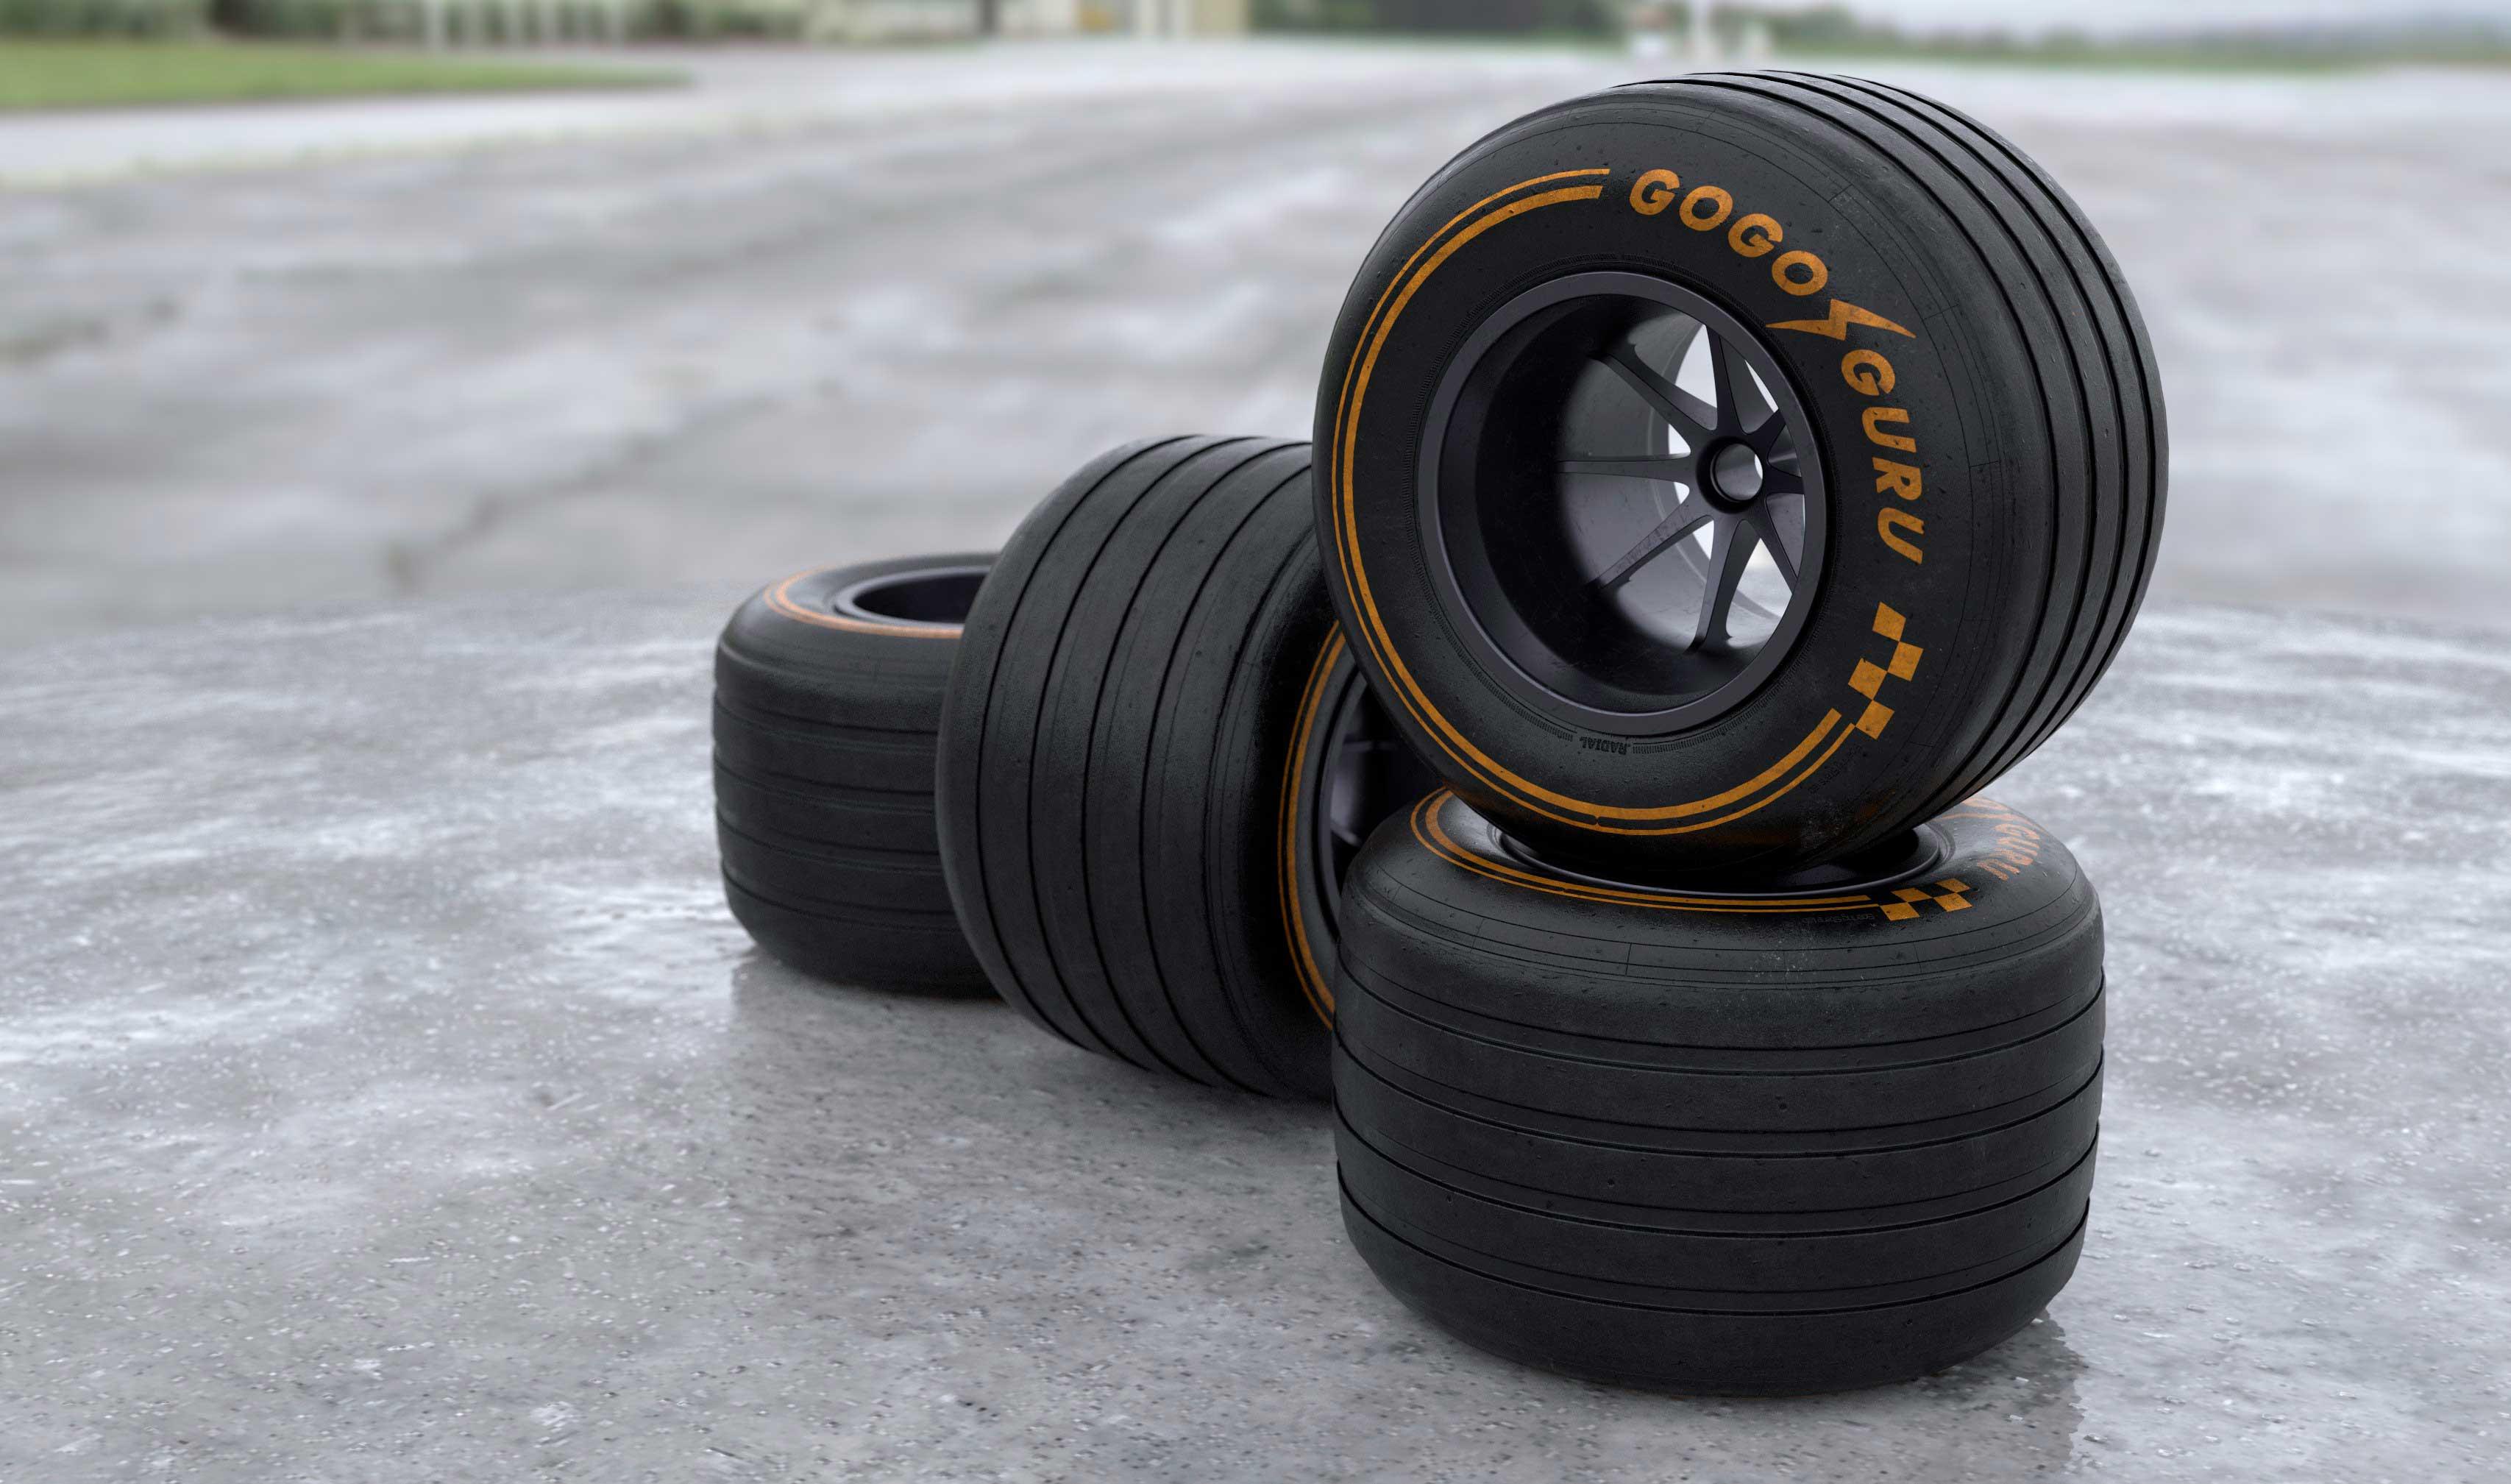 Wets: GOGO GURU 2019 F1 rear tiers made by Alan Mattano at SoaringStars lab